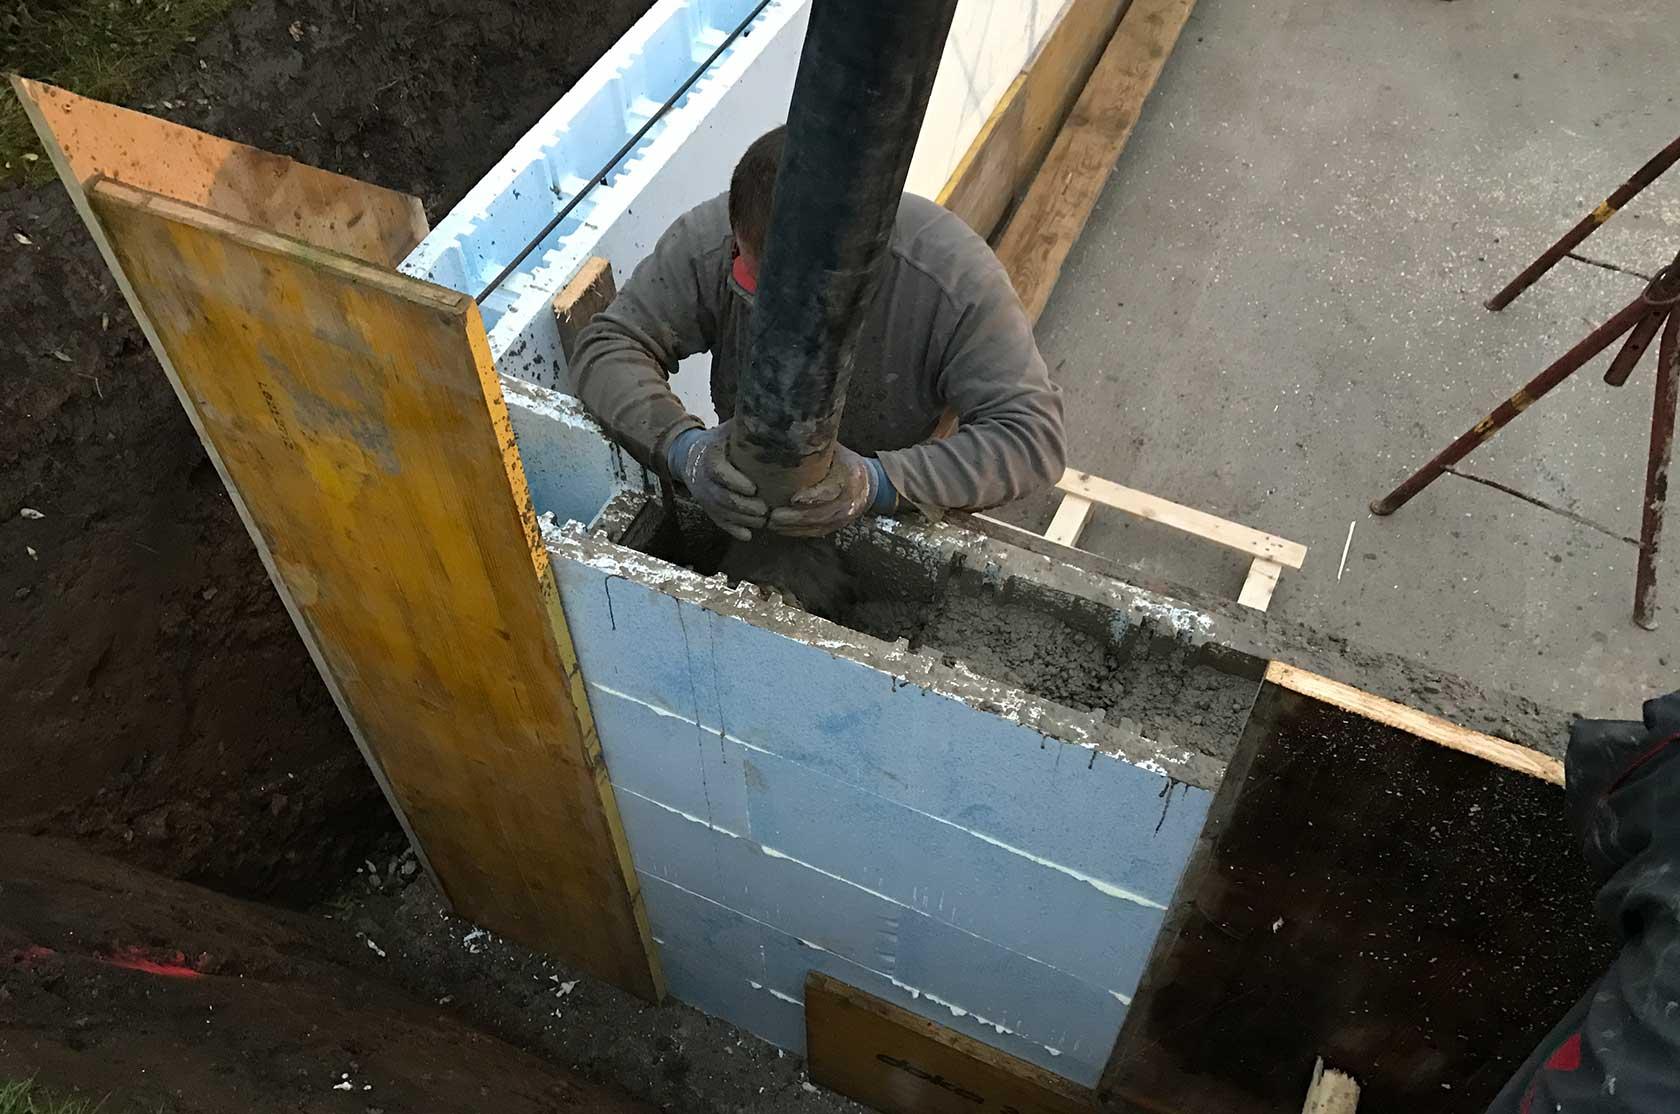 Styroporpool 800x400x150cm mit treppe zum selbstbau - Betonpool bauen ...